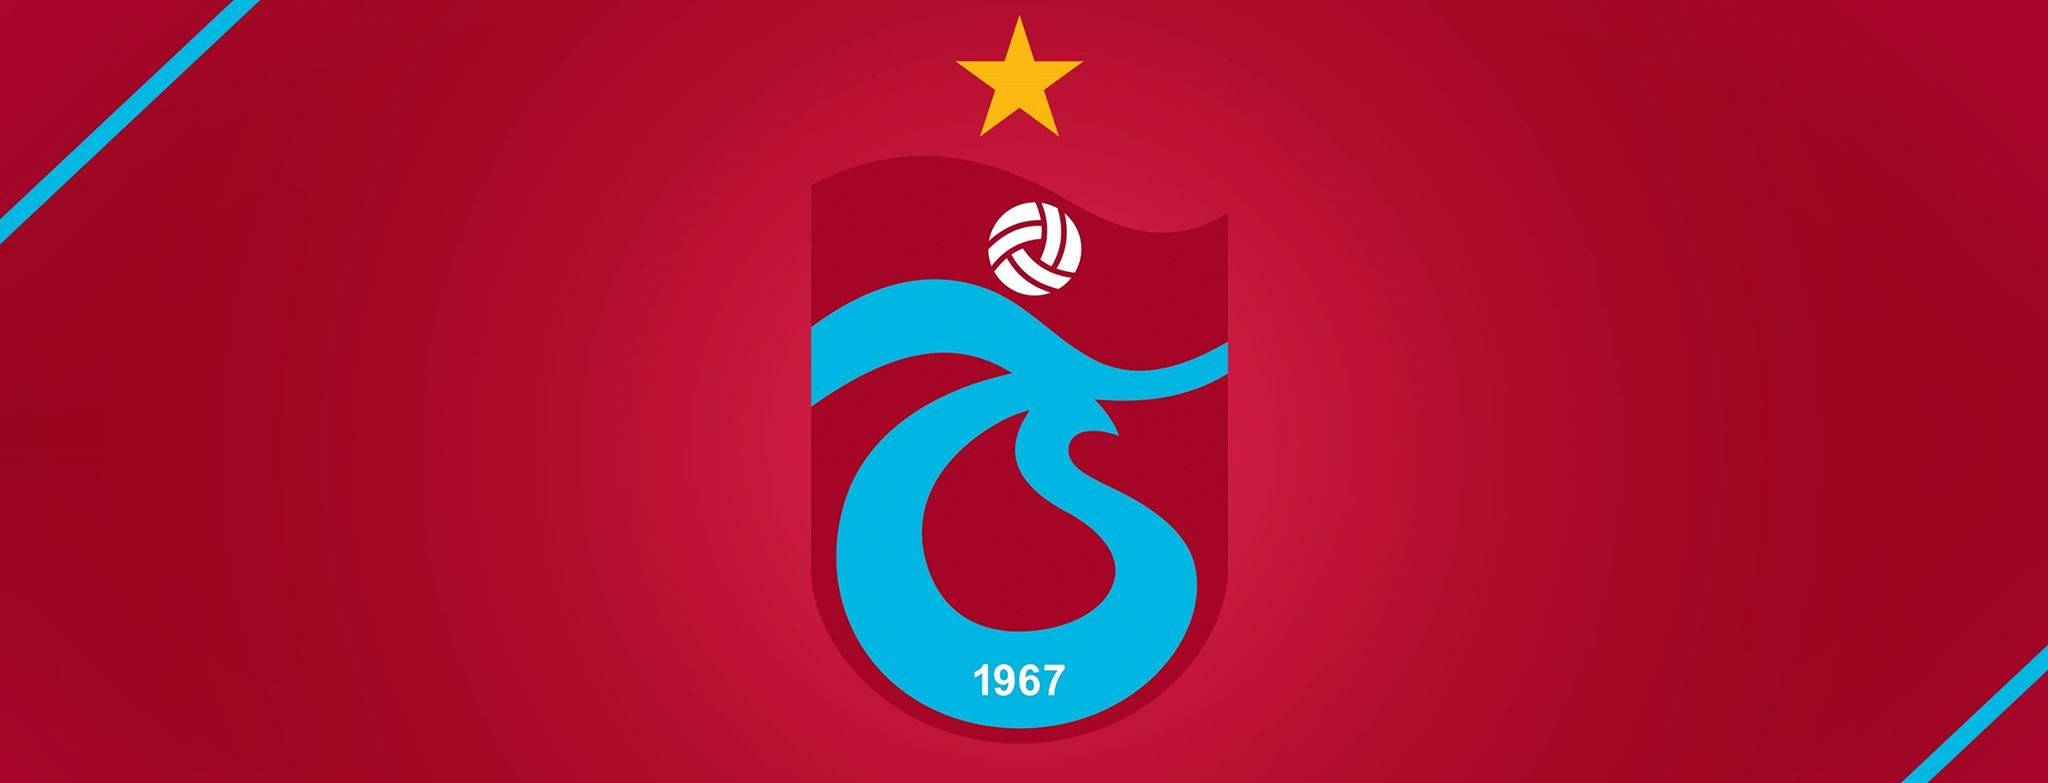 Trabzonspor'dan flaş ceza açıklaması